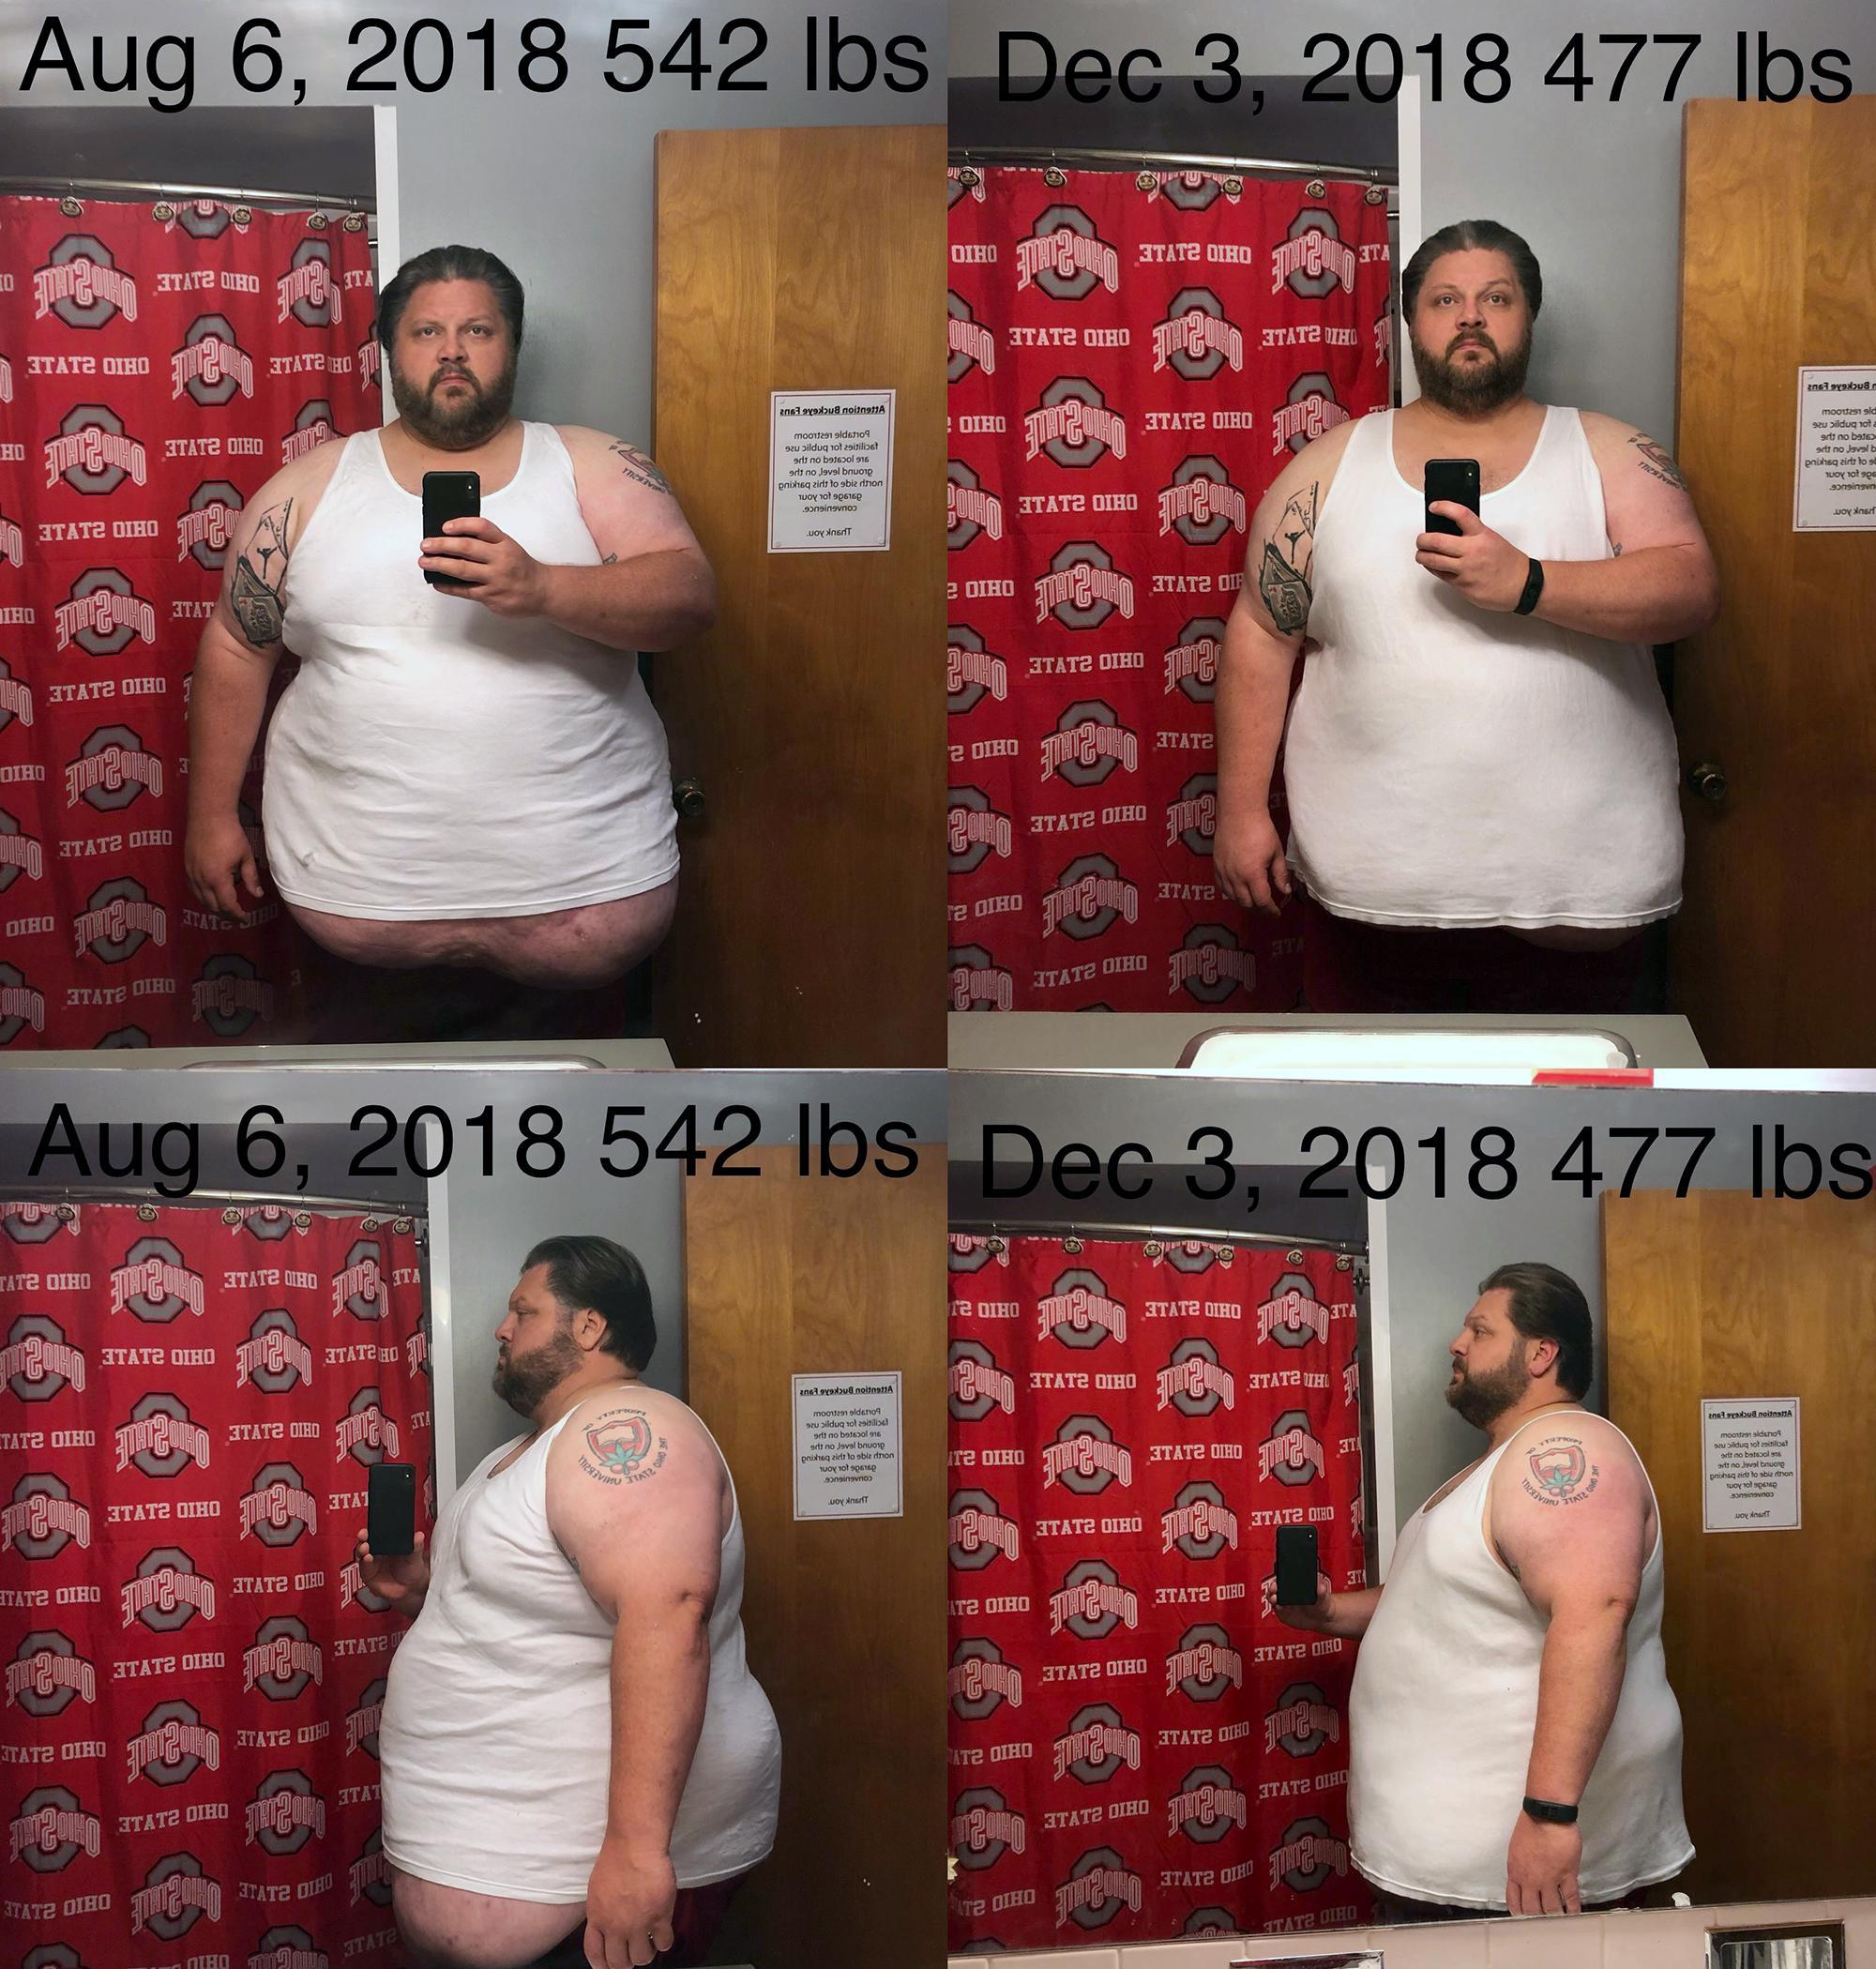 6 foot 1 Male Progress Pics of 65 lbs Weight Loss 542 lbs to 477 lbs